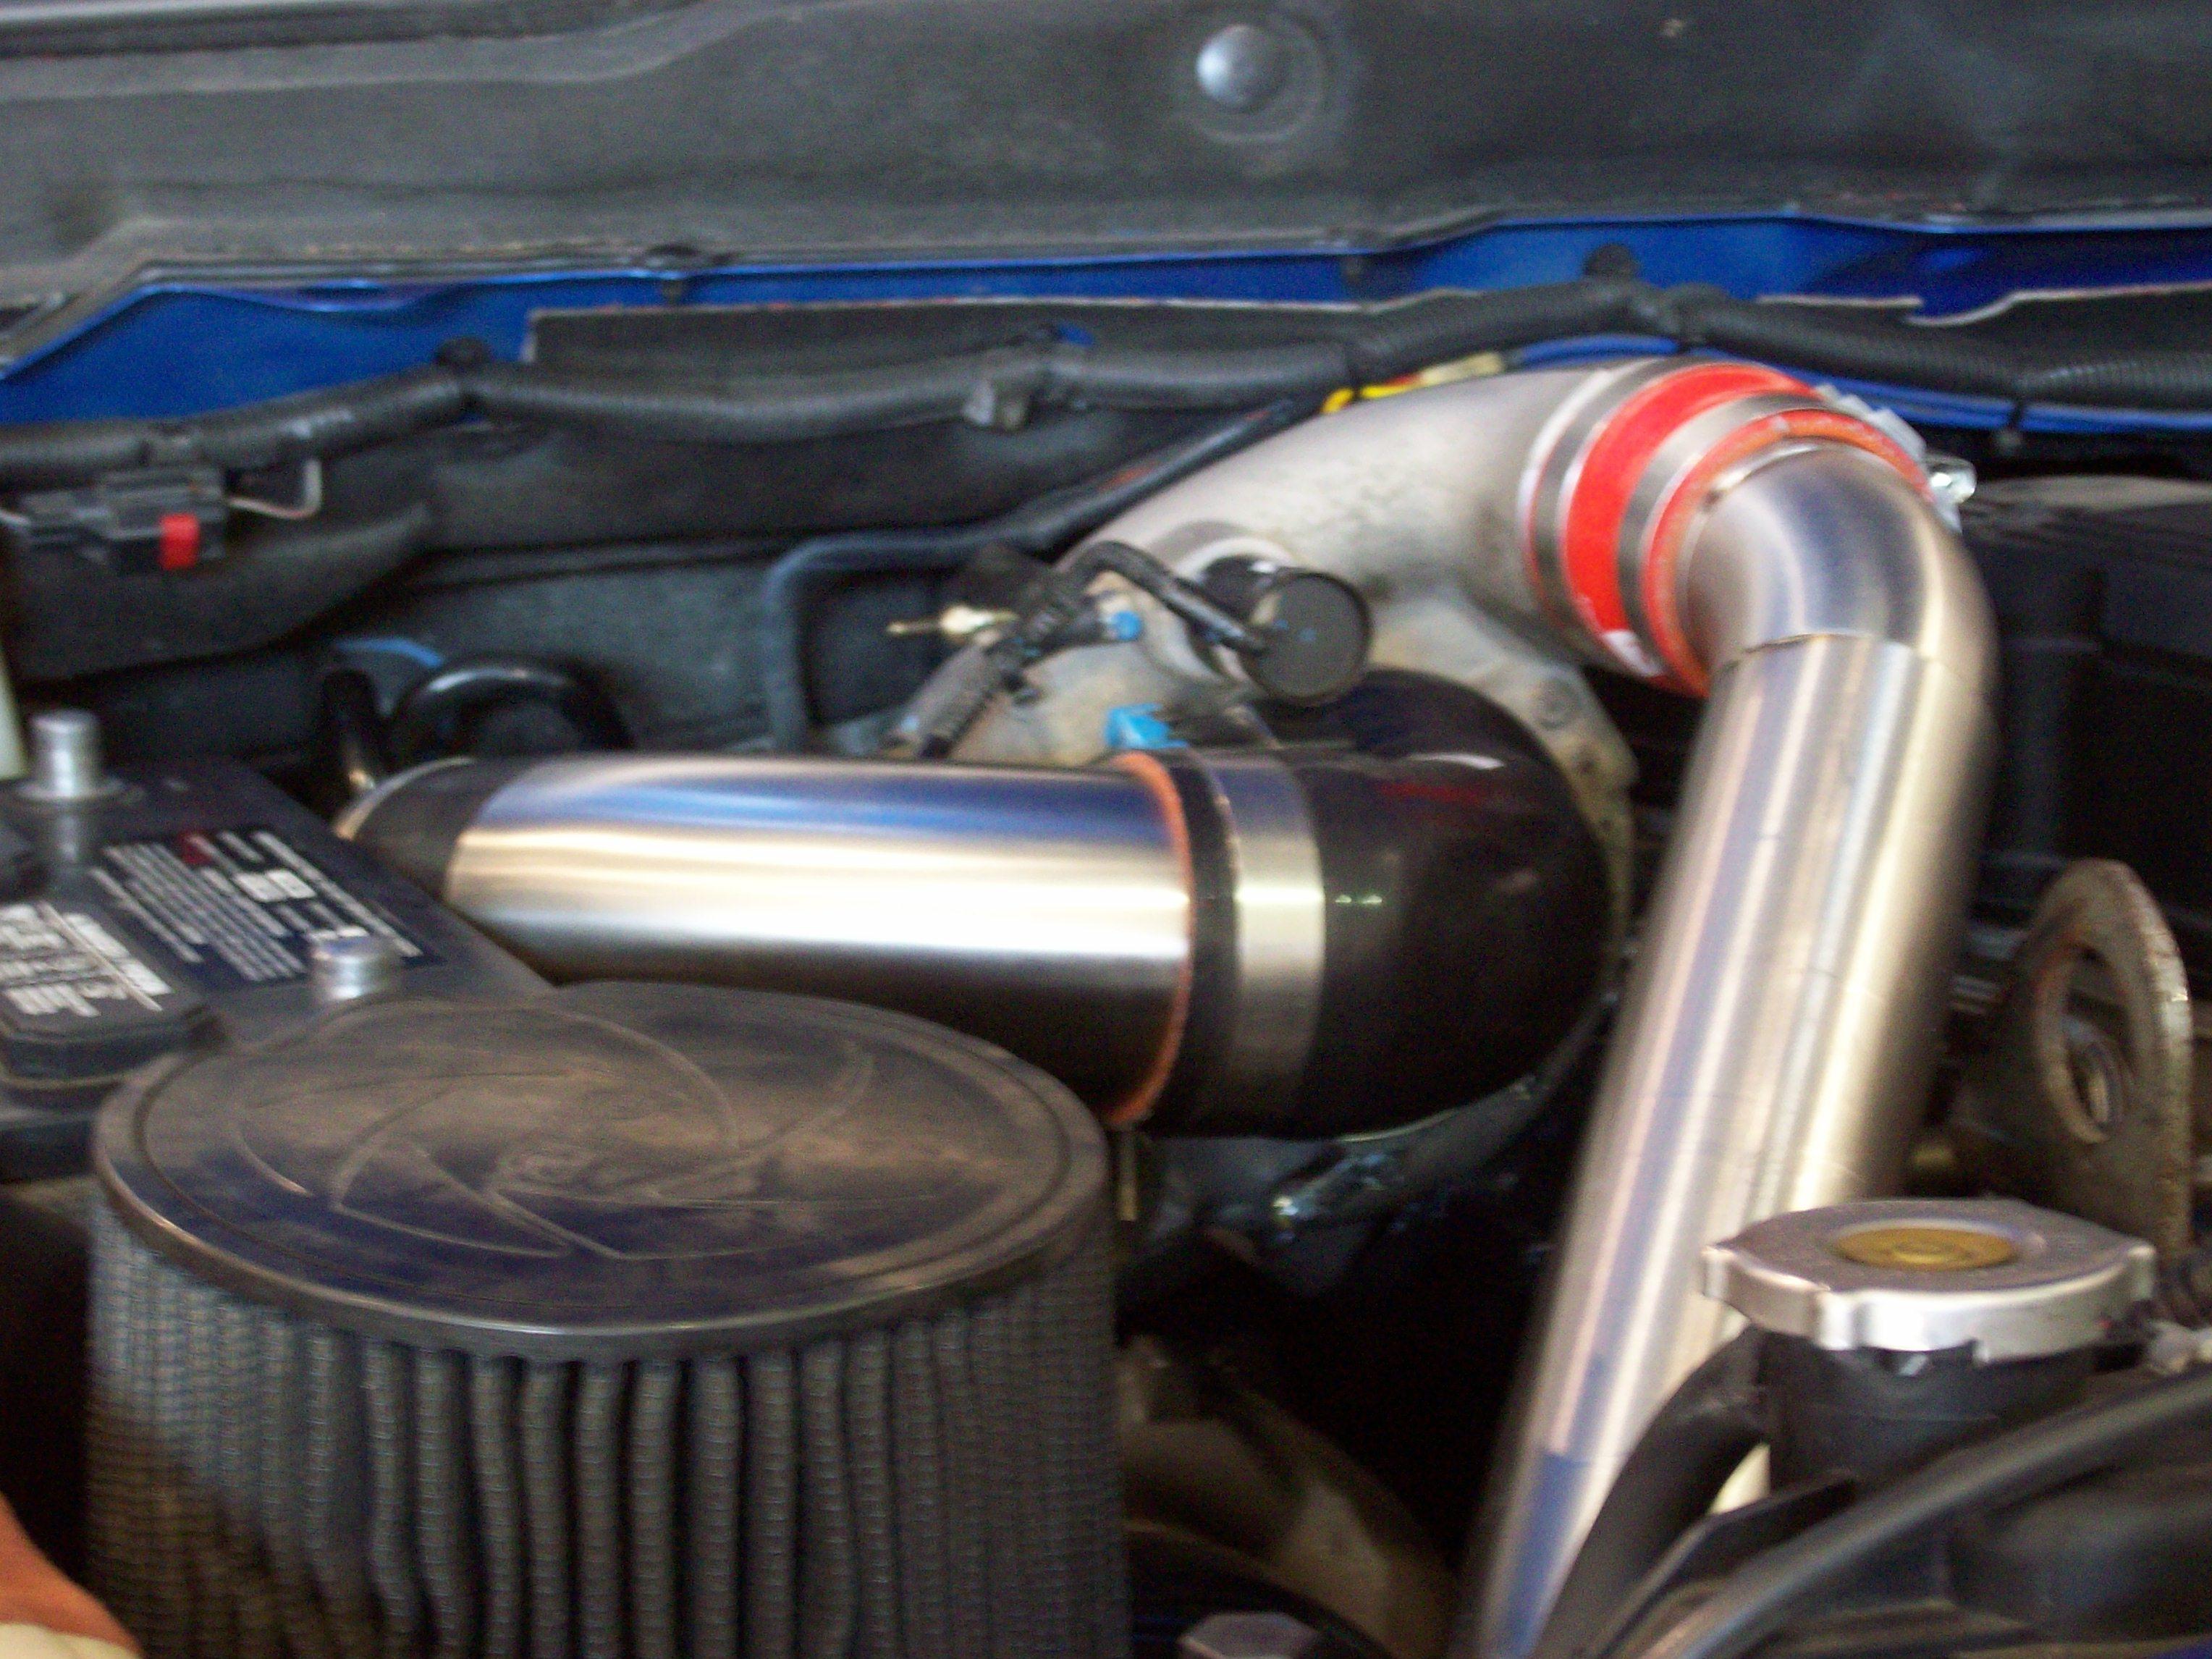 PDR Diesel COBRA STG 7 STOCK TURBO W/S400 TWIN KIT